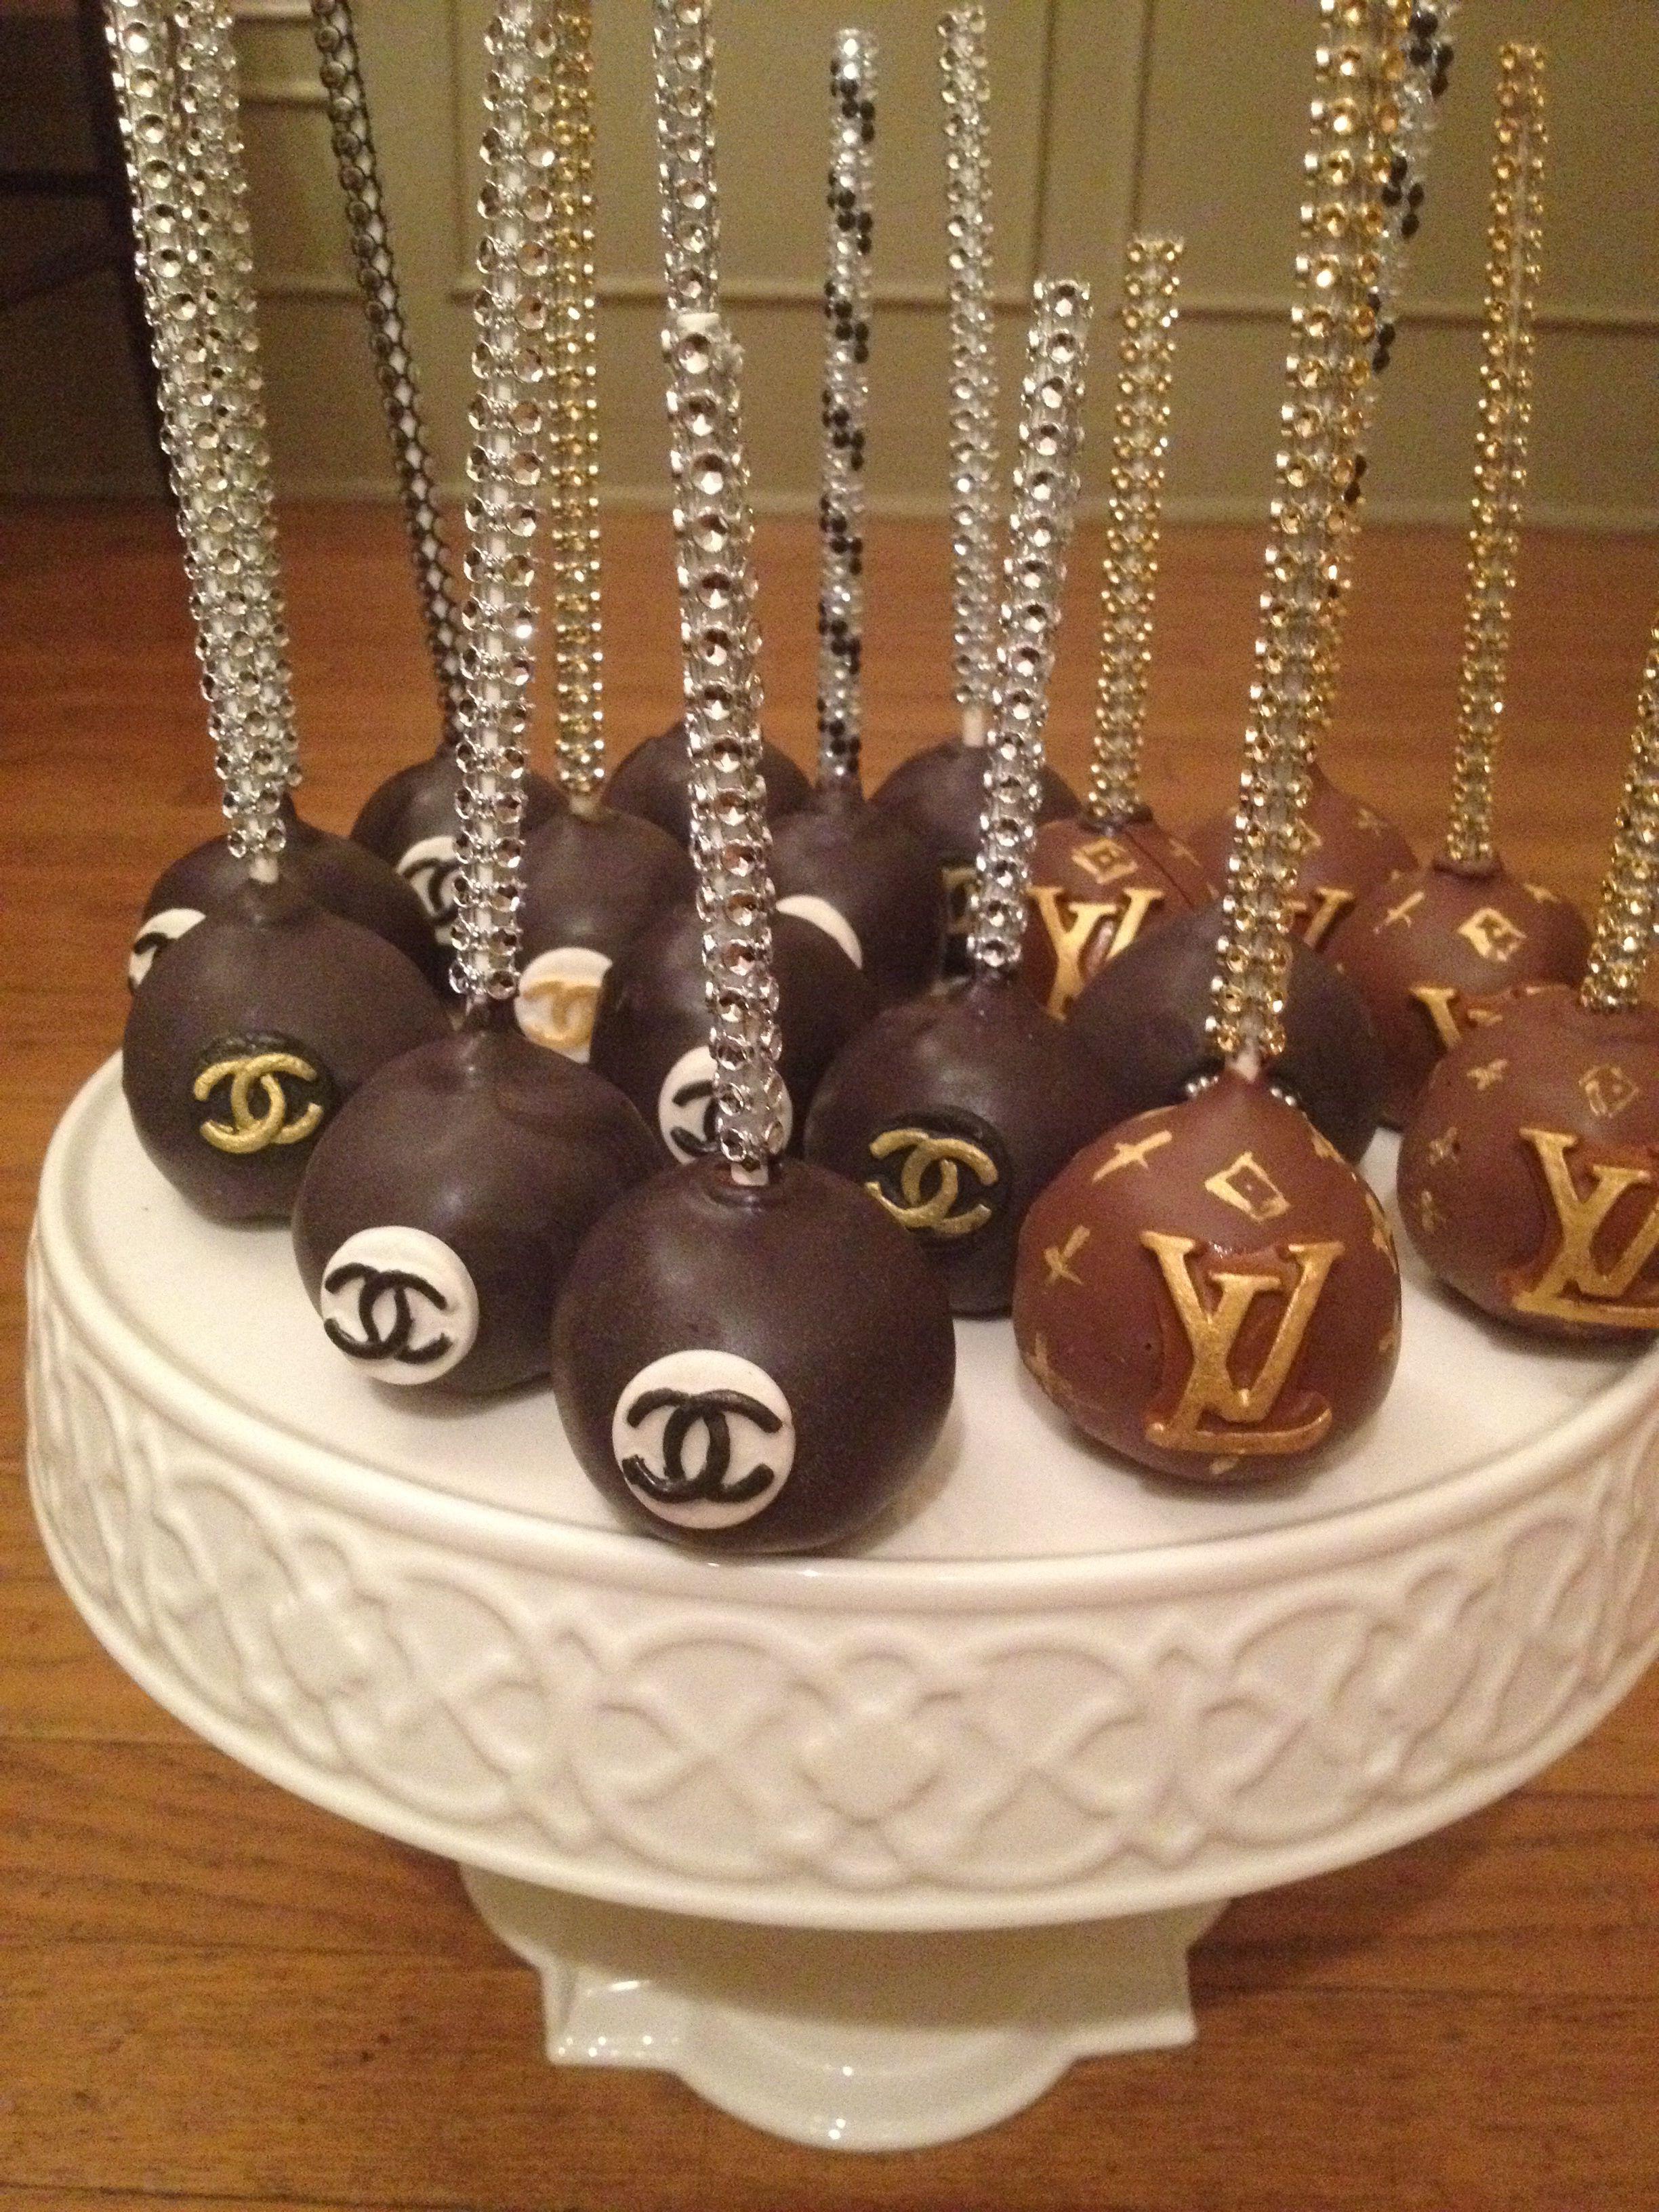 Fine Chanel Lv Cake Pops With Images Elegant Cake Pops Cake Pops Funny Birthday Cards Online Inifodamsfinfo